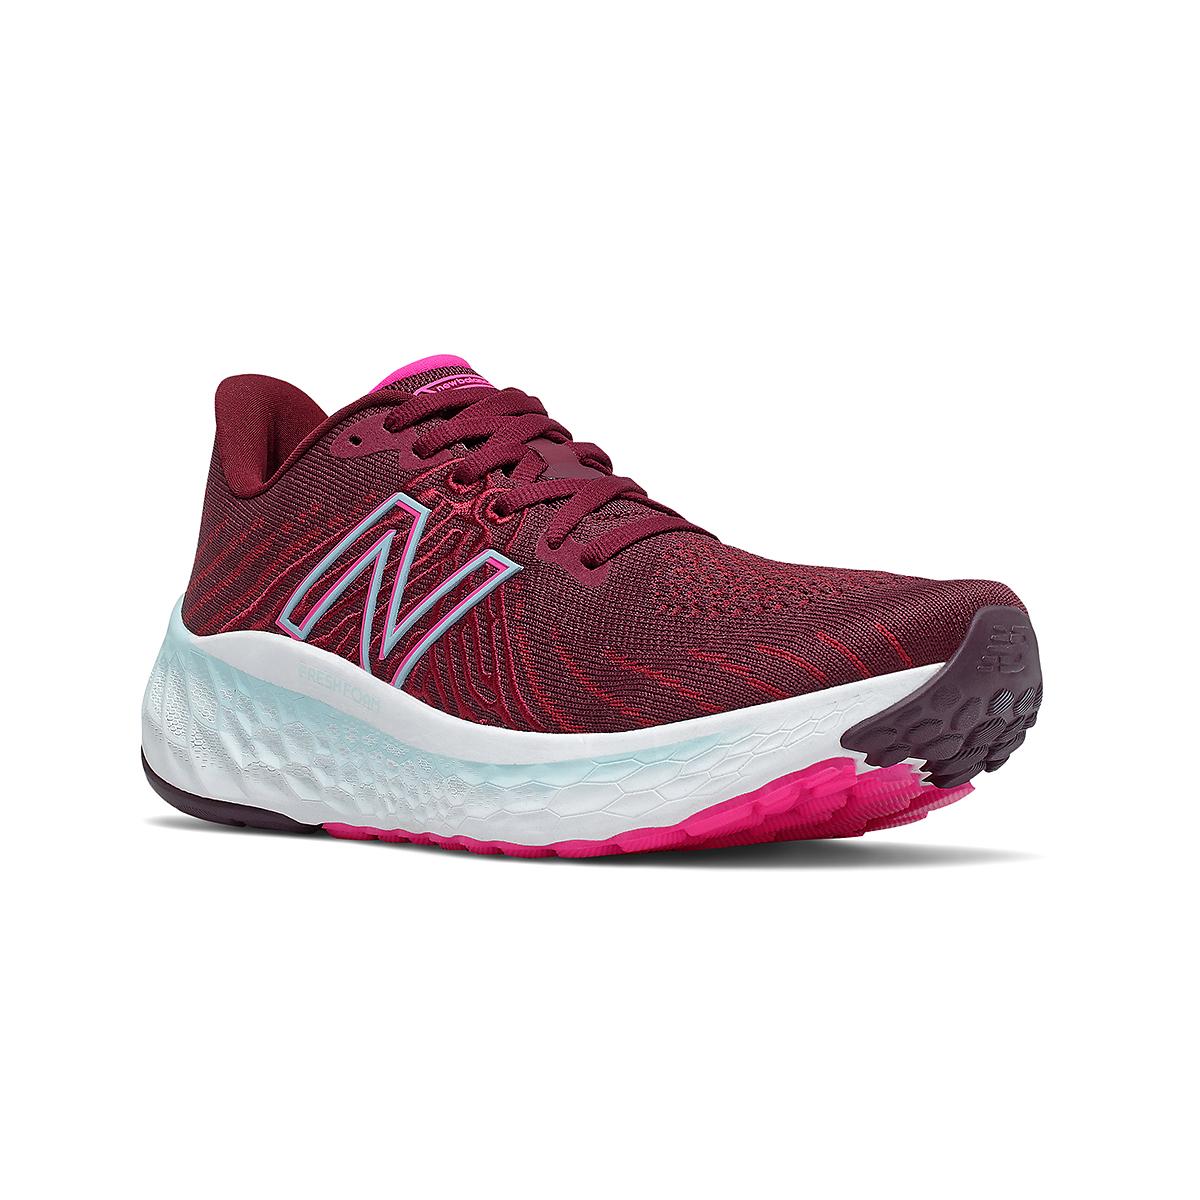 Women's New Balance Fresh Foam Vongo V5 Running Shoe - Color: Garnet/Pink Glo - Size: 5 - Width: Regular, Garnet/Pink Glo, large, image 3